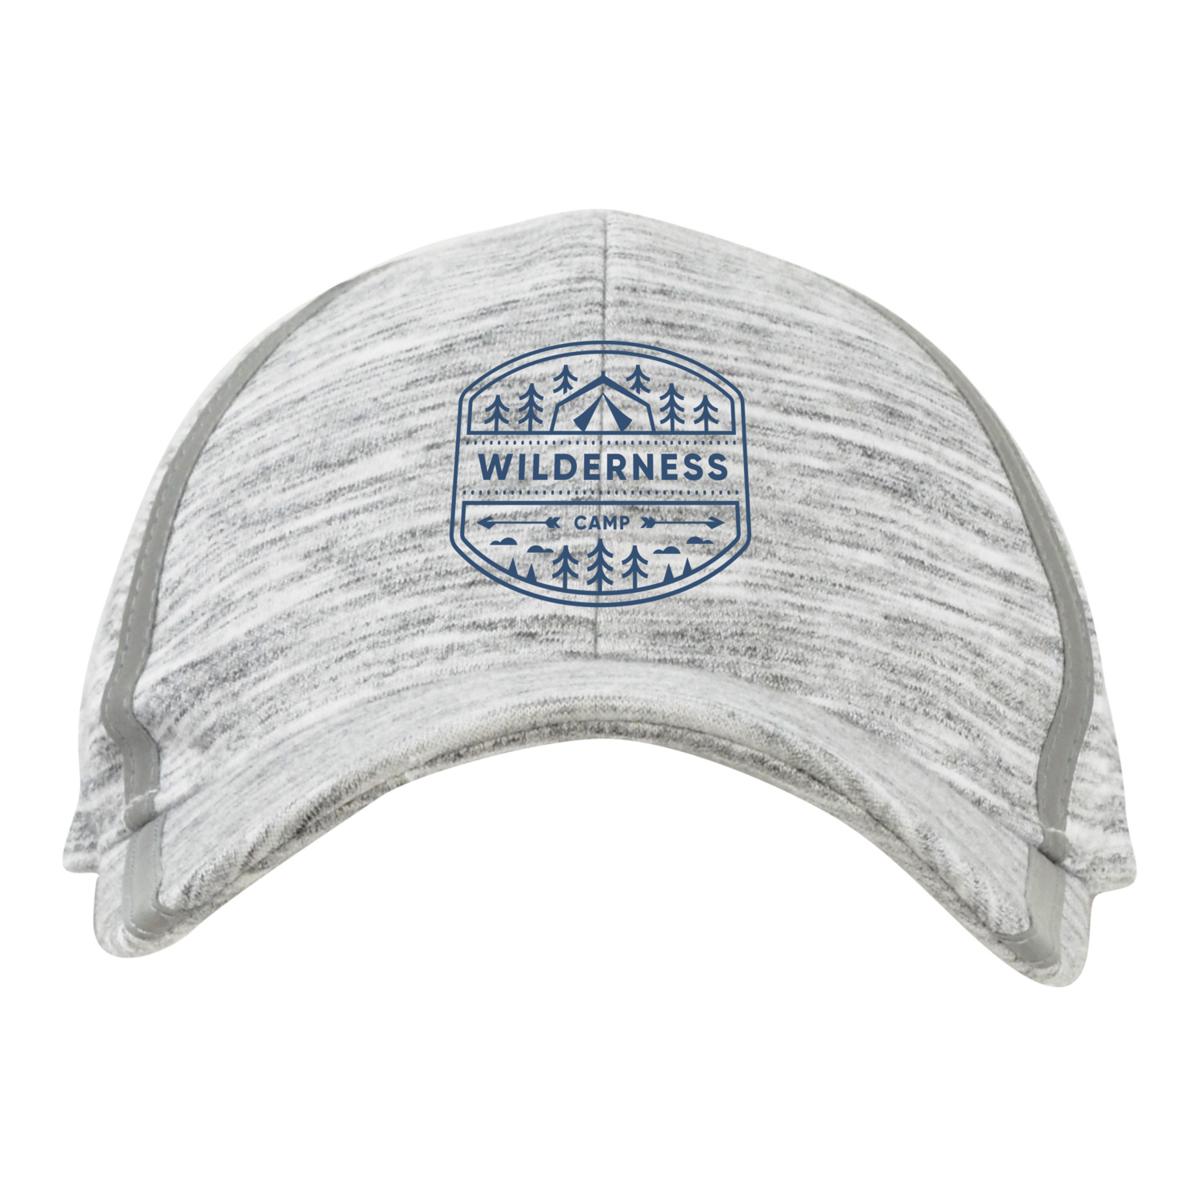 REFLECTIVE TAPE HEATHERED CAP